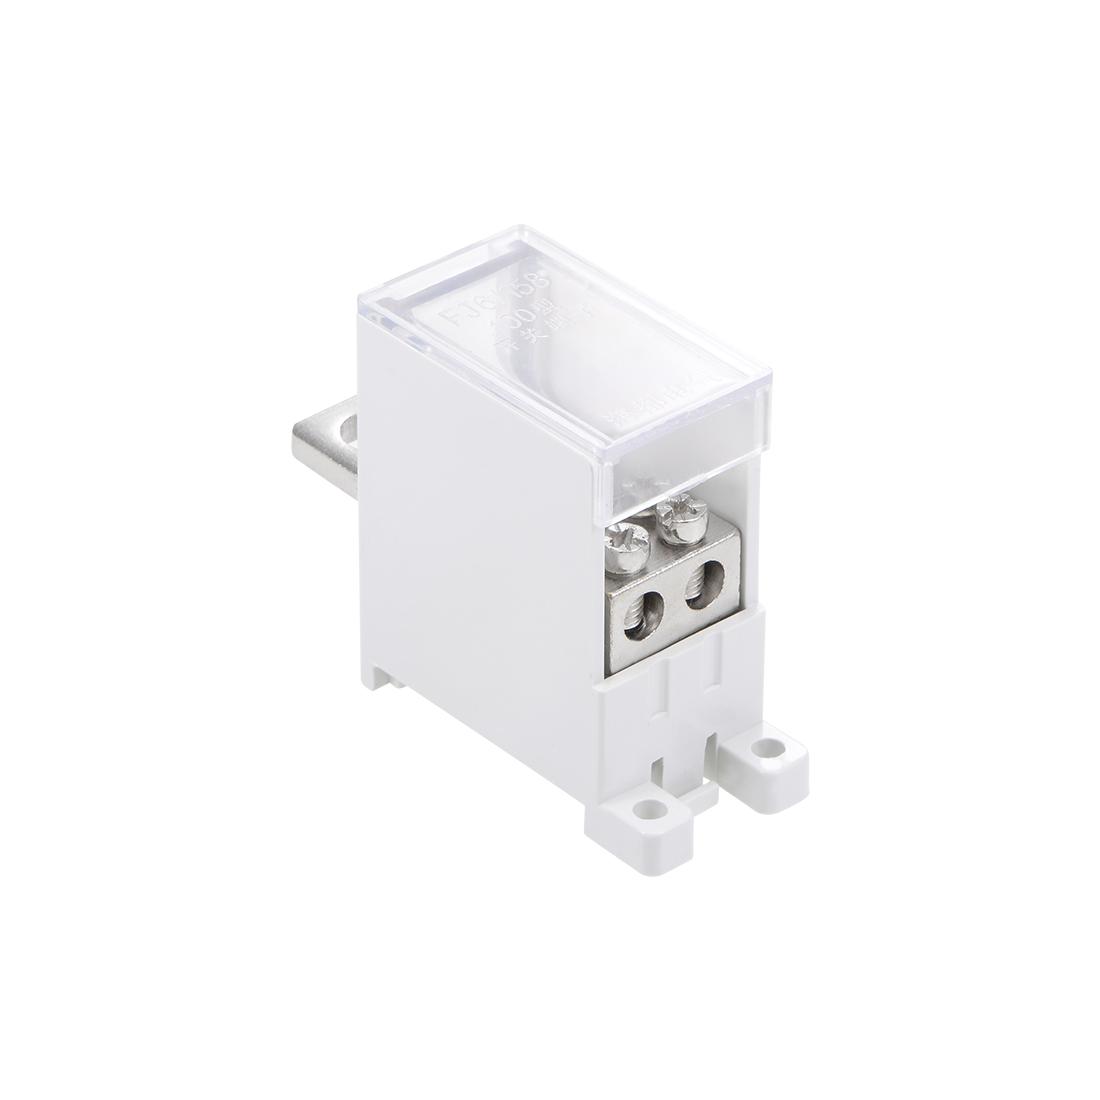 1 Inlet 2 Outlet DIN Rail Terminal Blocks 125A Max Input Distribution Block